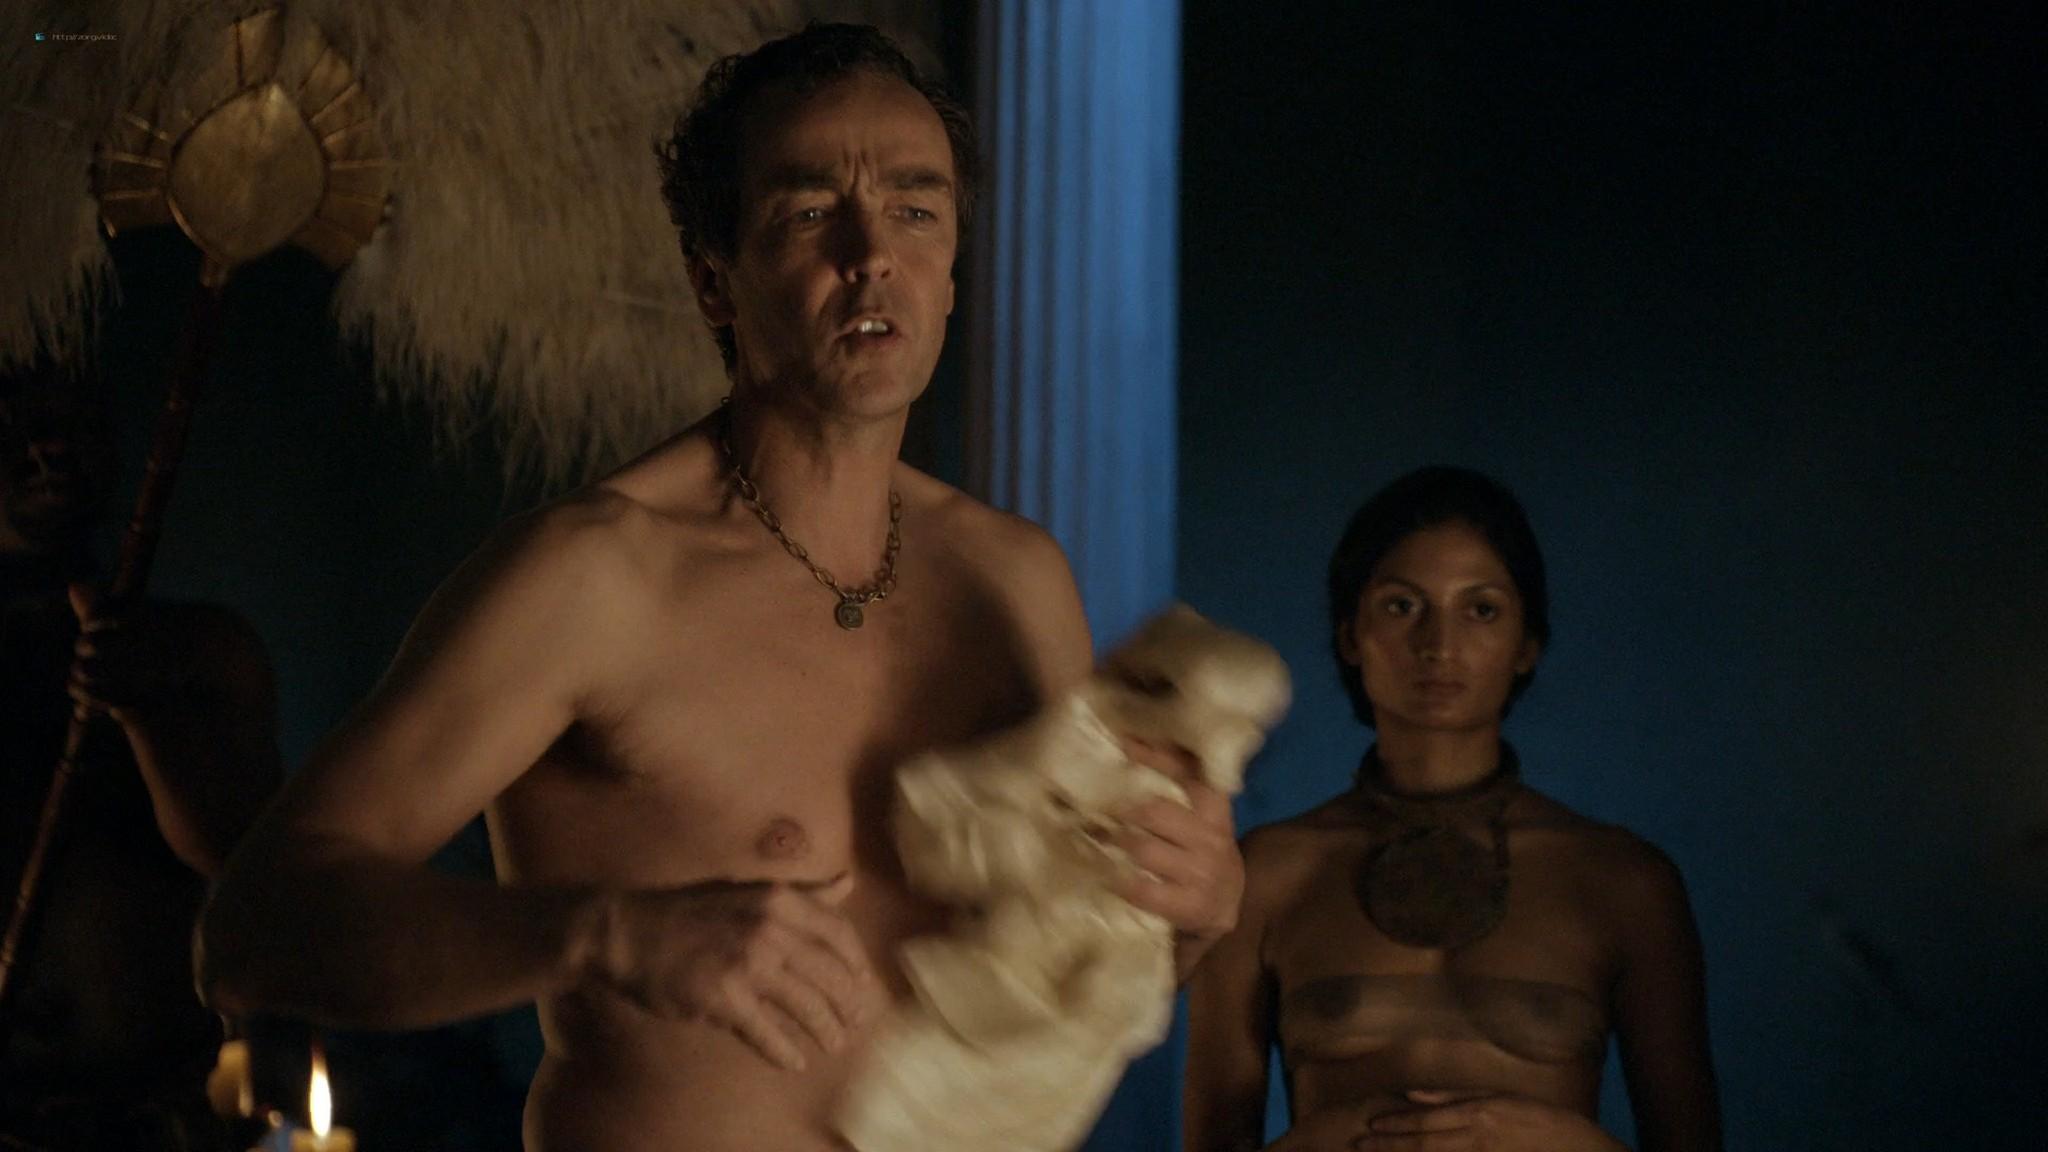 Lucy Lawless nude sex Erin Cummings, Aria Dickson nude too - Spartacus - Sacramentum Gladiatorum (2010) s1e2 HD 1080p (6)